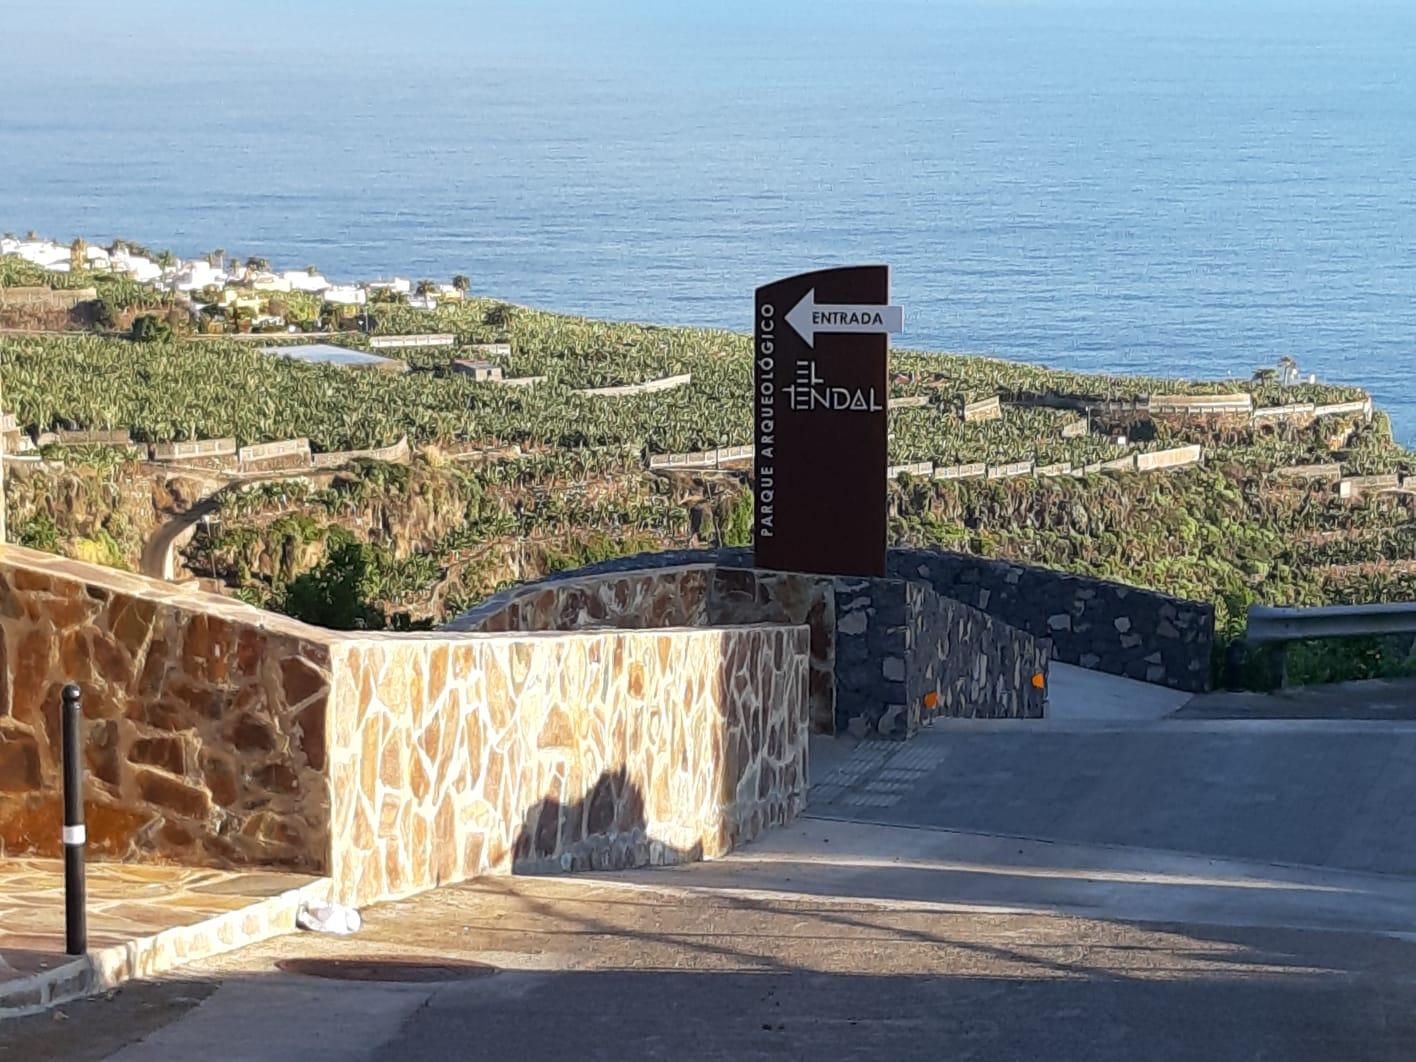 Besuchen Sie La Palma - Archäologischer Park Cueva del Tendal